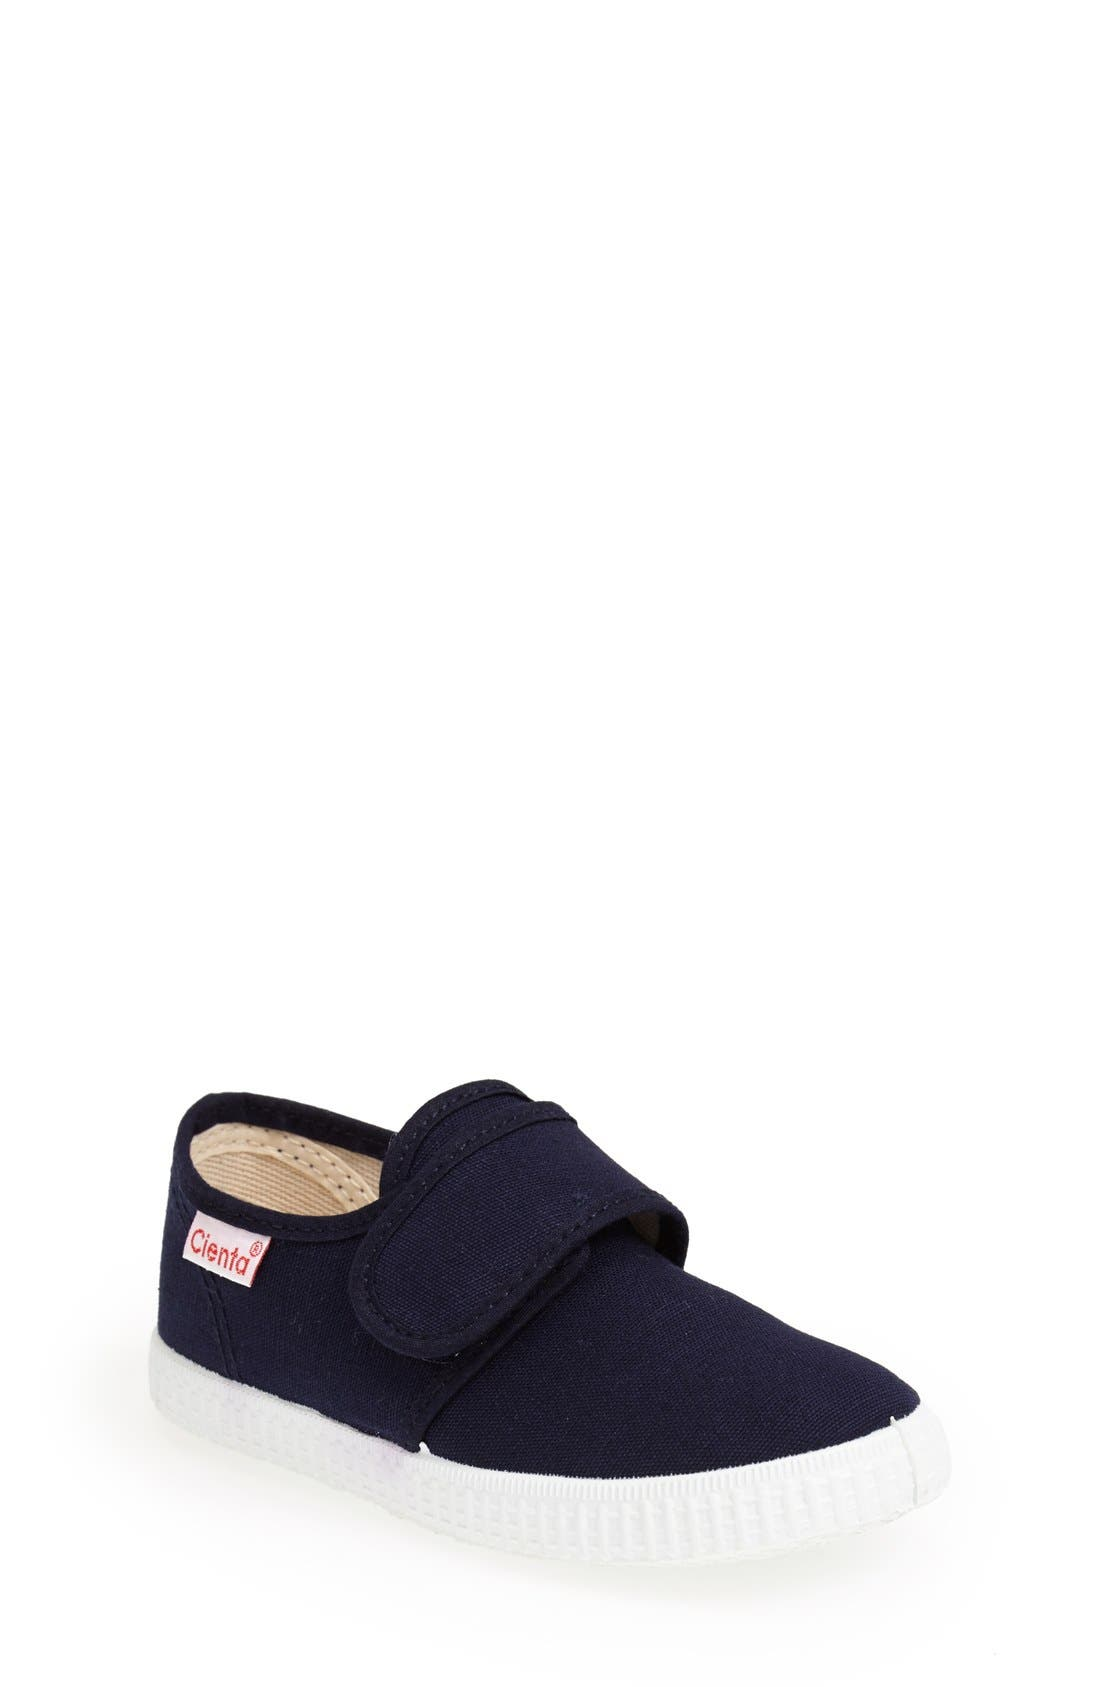 Canvas Sneaker,                         Main,                         color, Navy